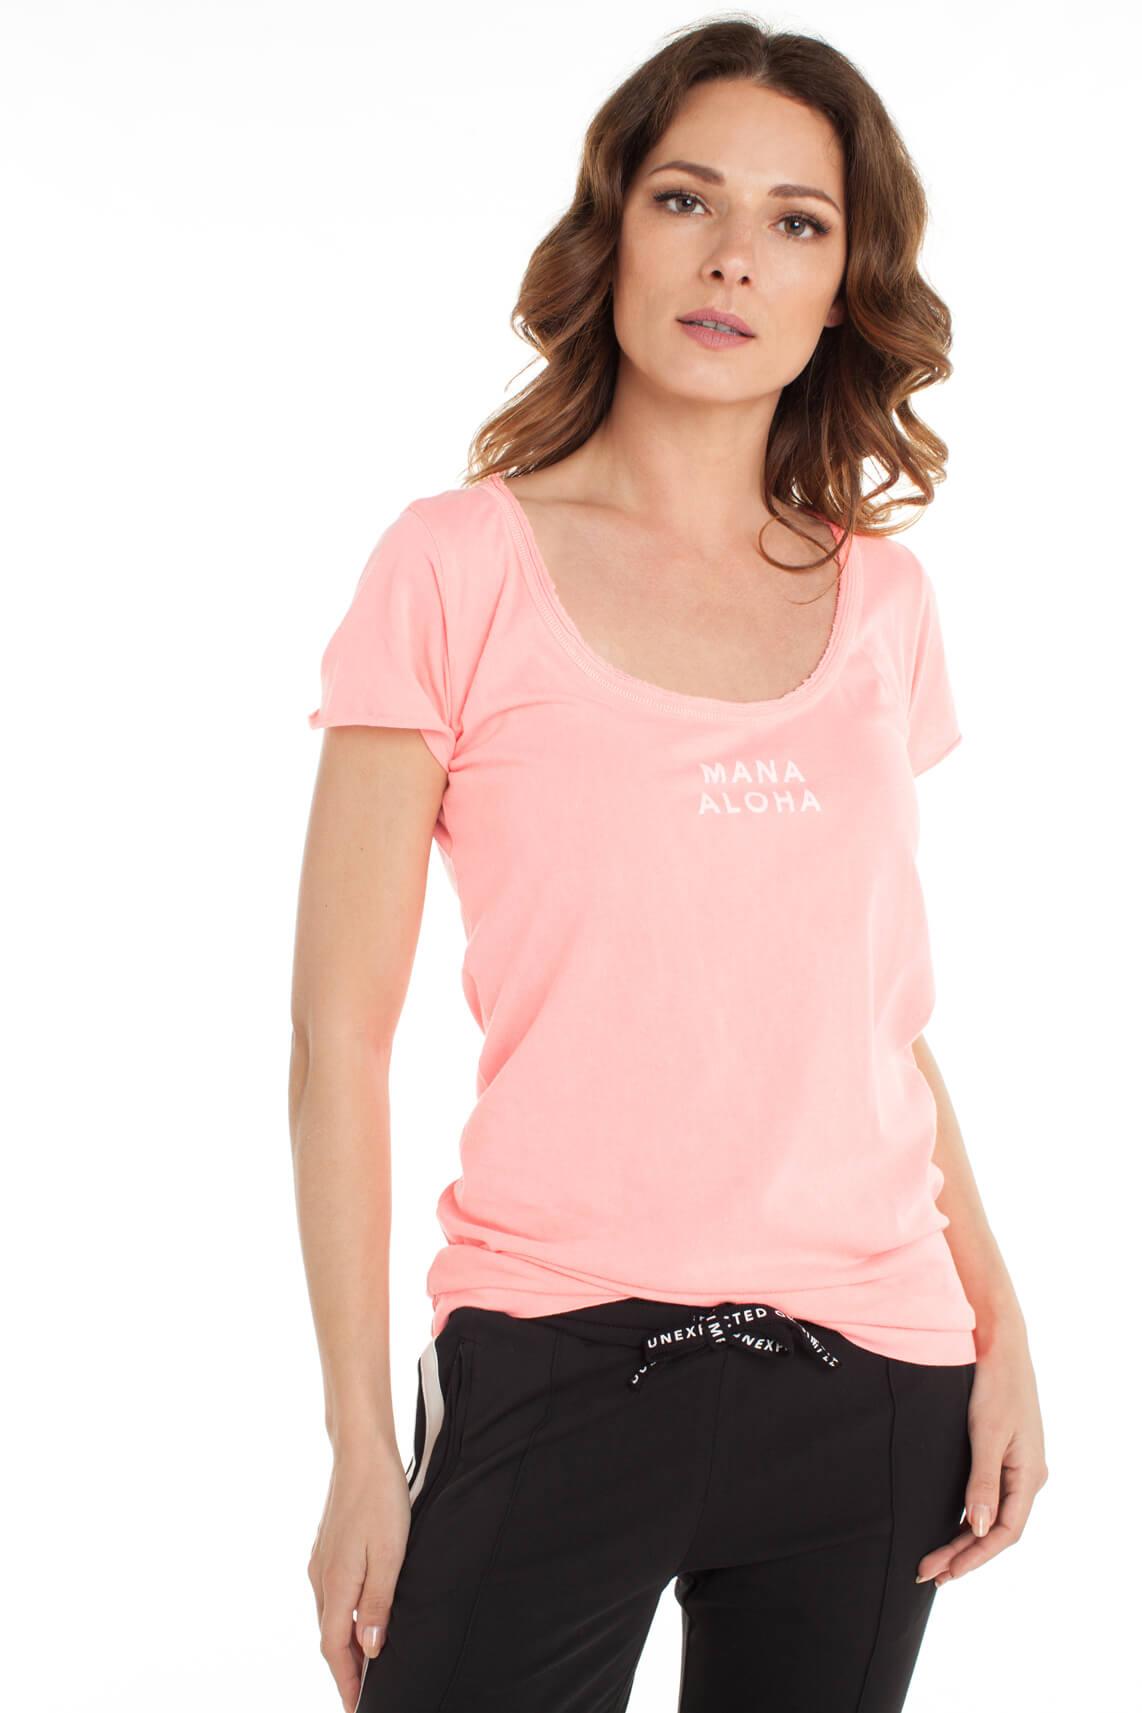 10 Days Dames Shirt met tekstprint roze